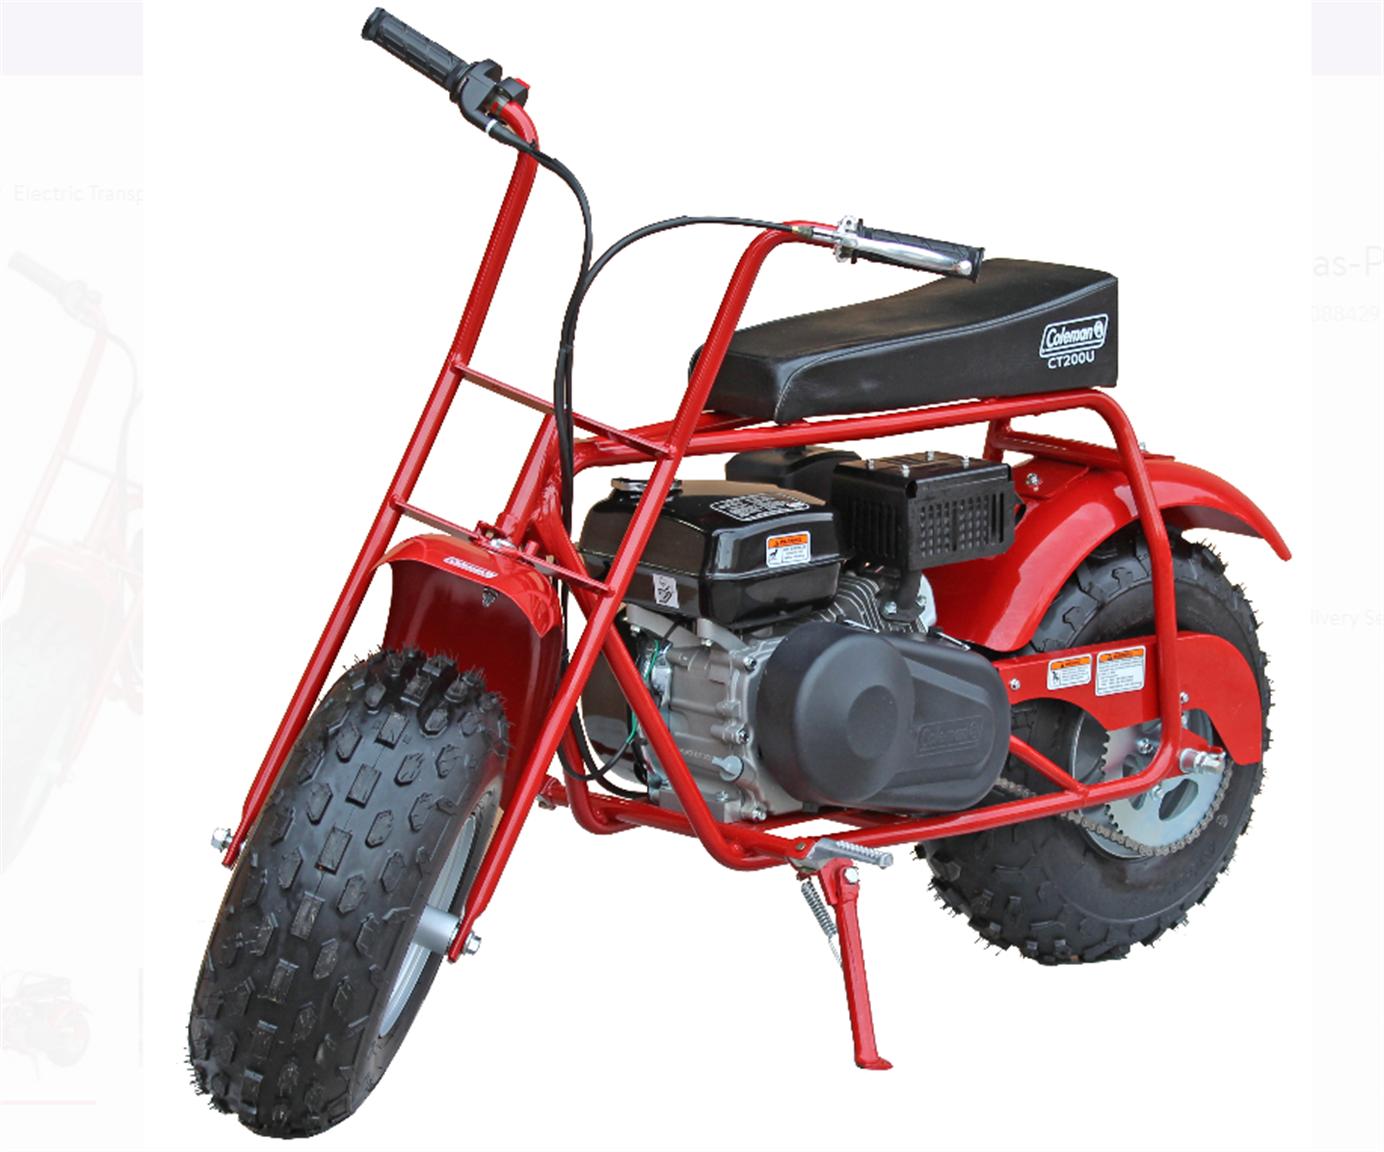 Walmart.com – Coleman CT200U-A Trail 196cc Gas-Powered Mini Bike Only $449.00, Reg $599.00 + Free Store Pickup!